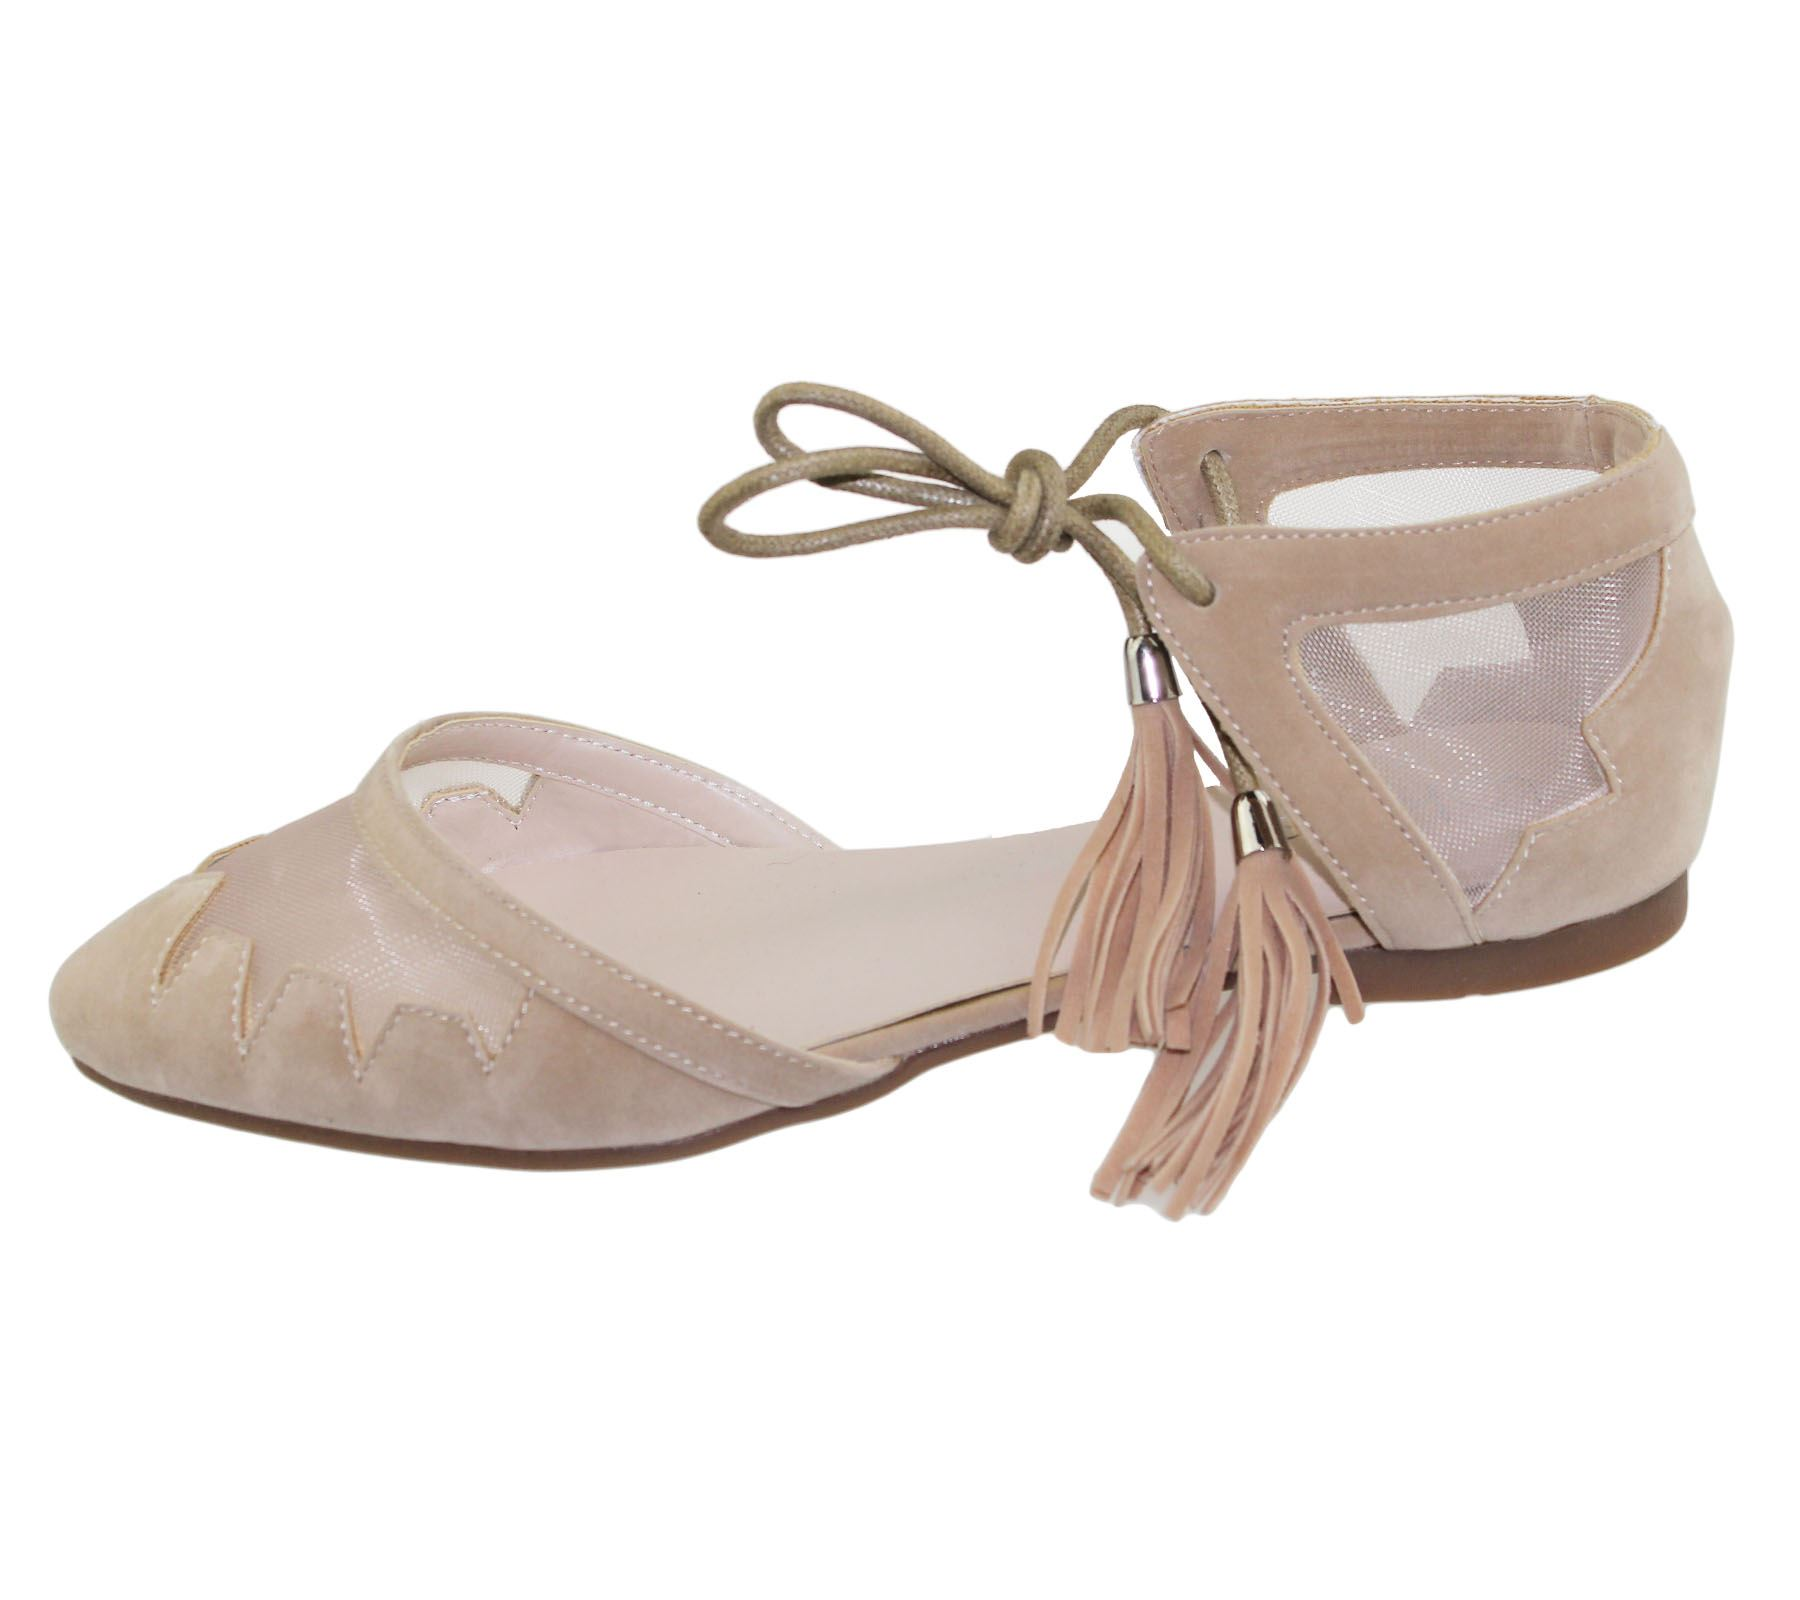 Womens-Flat-Ballerina-Dolly-Pumps-Ballet-Ladies-Summer-Mesh-Tassel-Shoes-Sandals thumbnail 11